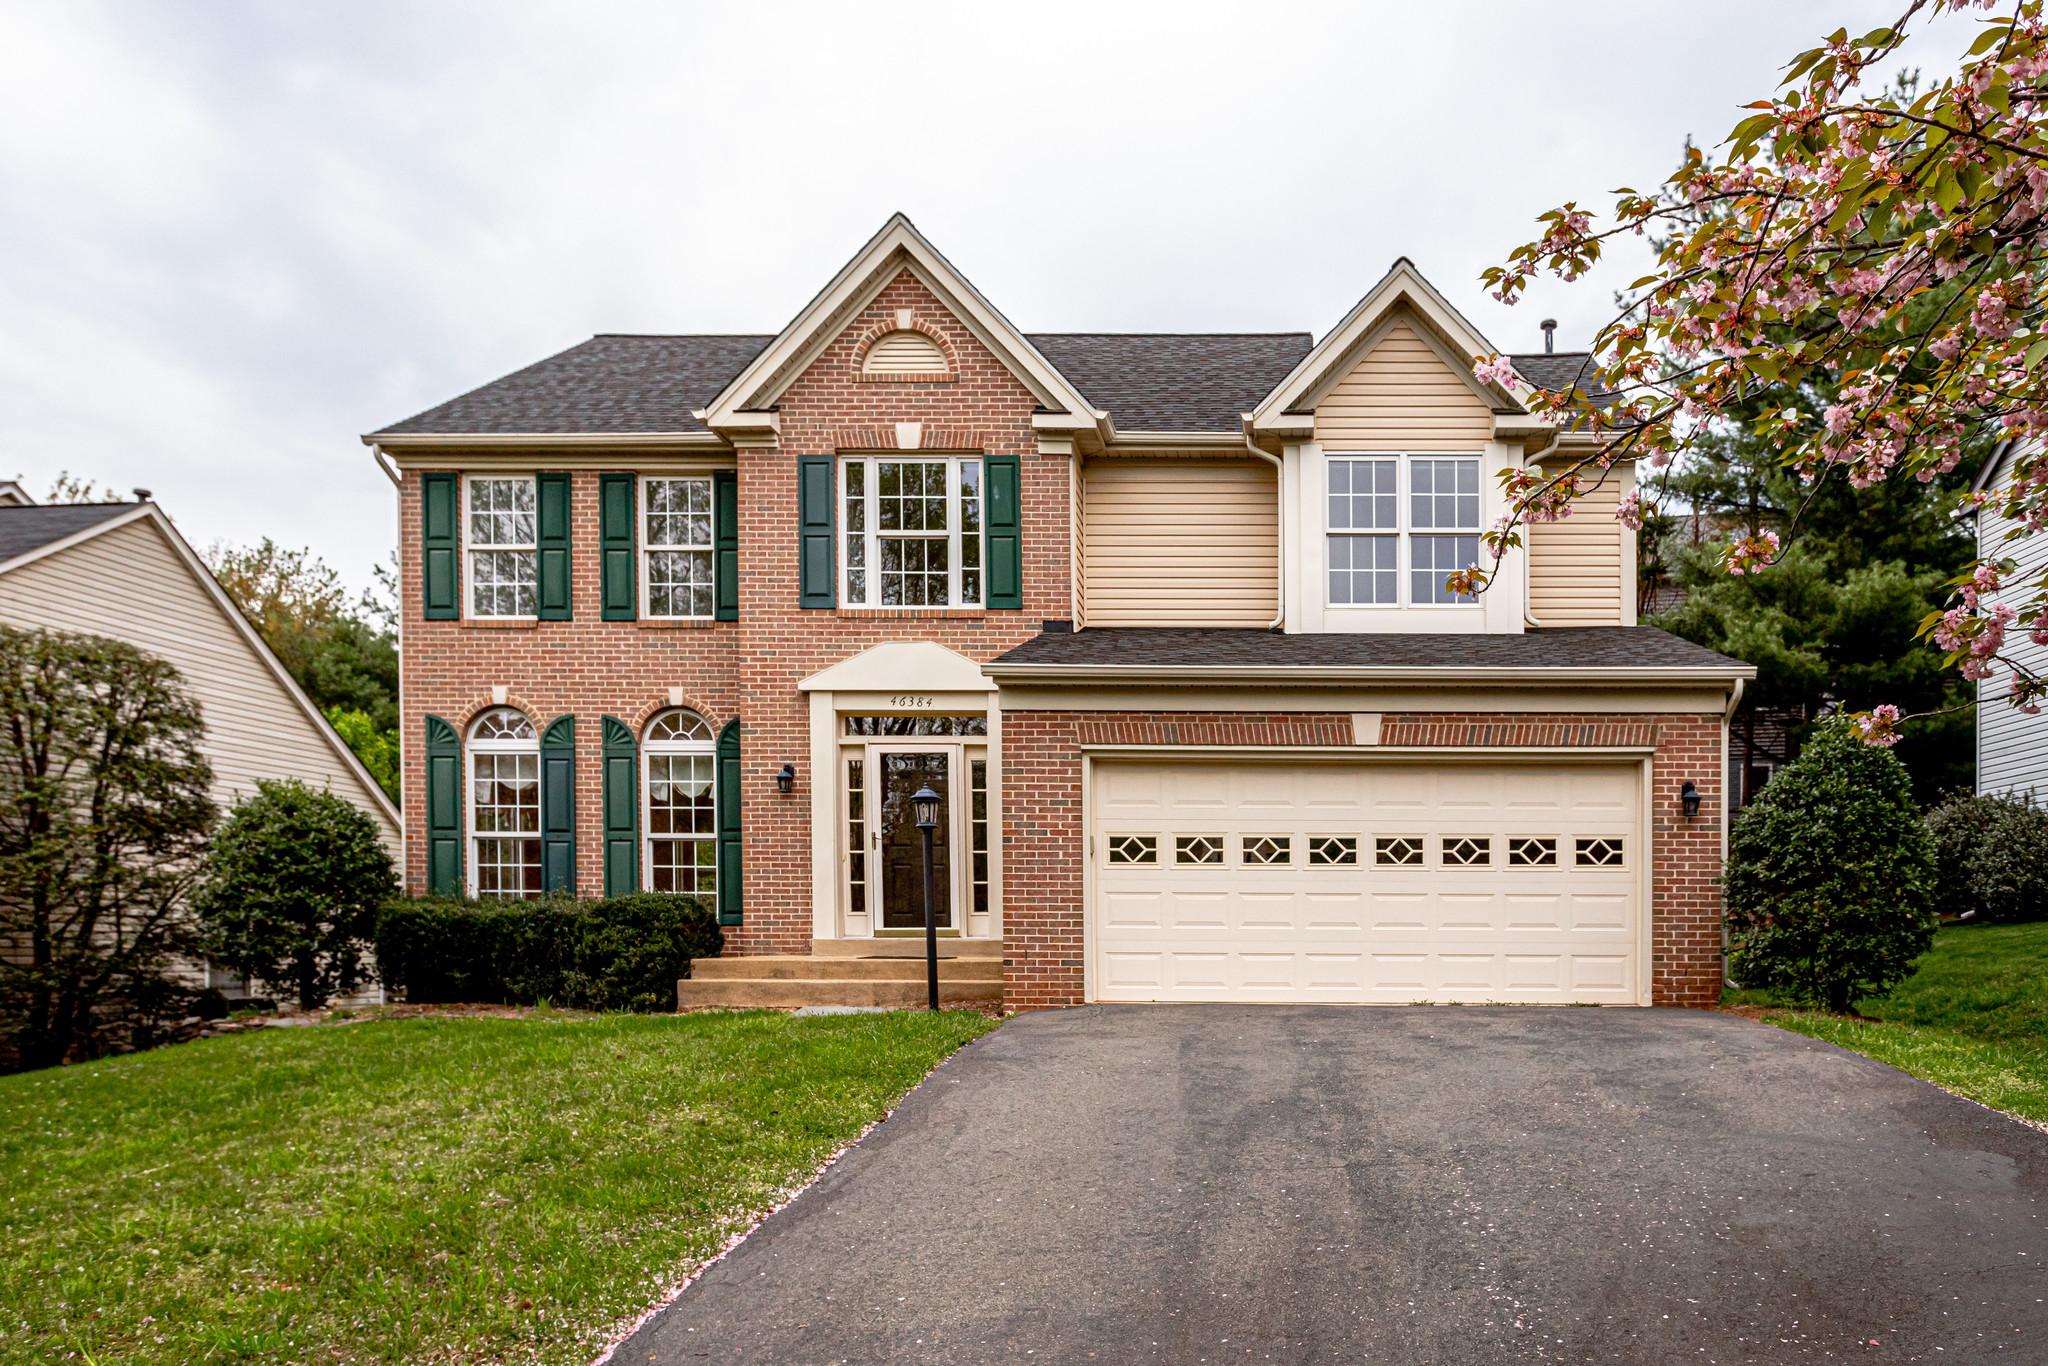 46384 Woodlake Pl, Sterling- For Sale